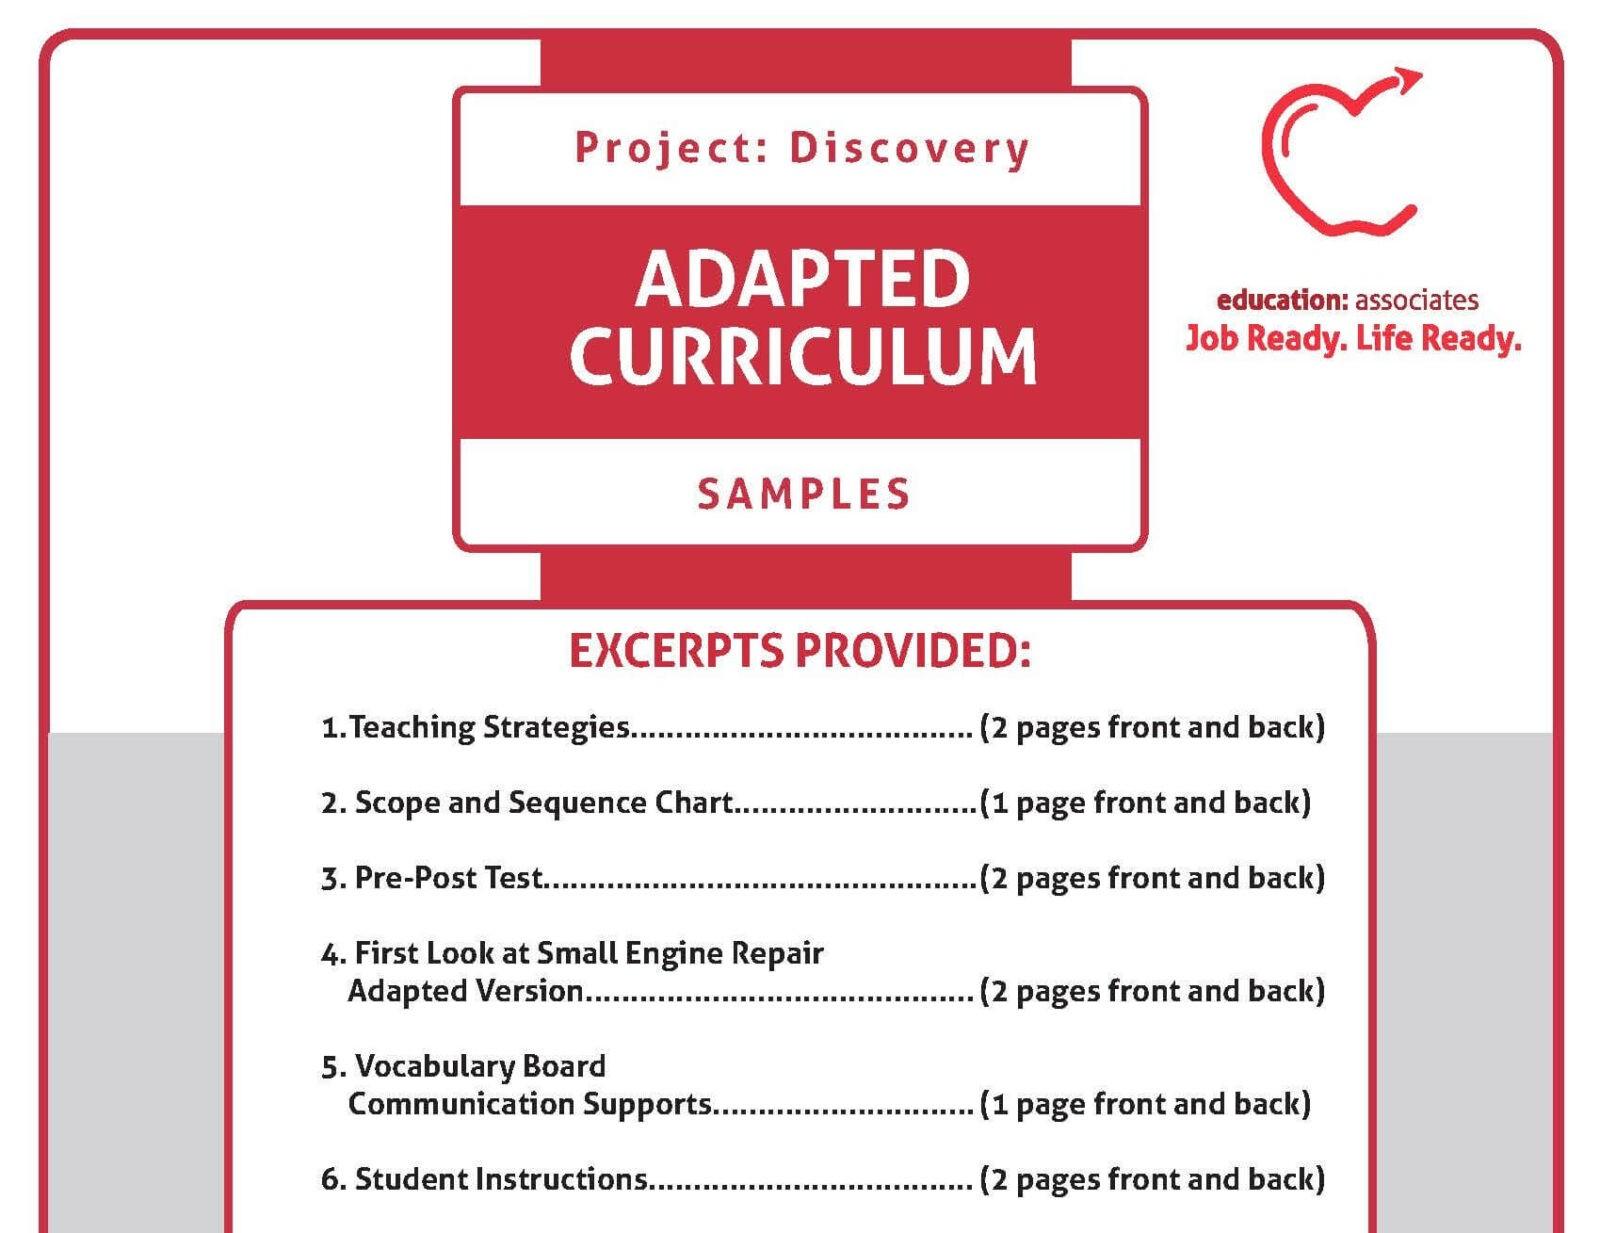 Curriculum Samples – Education Associates